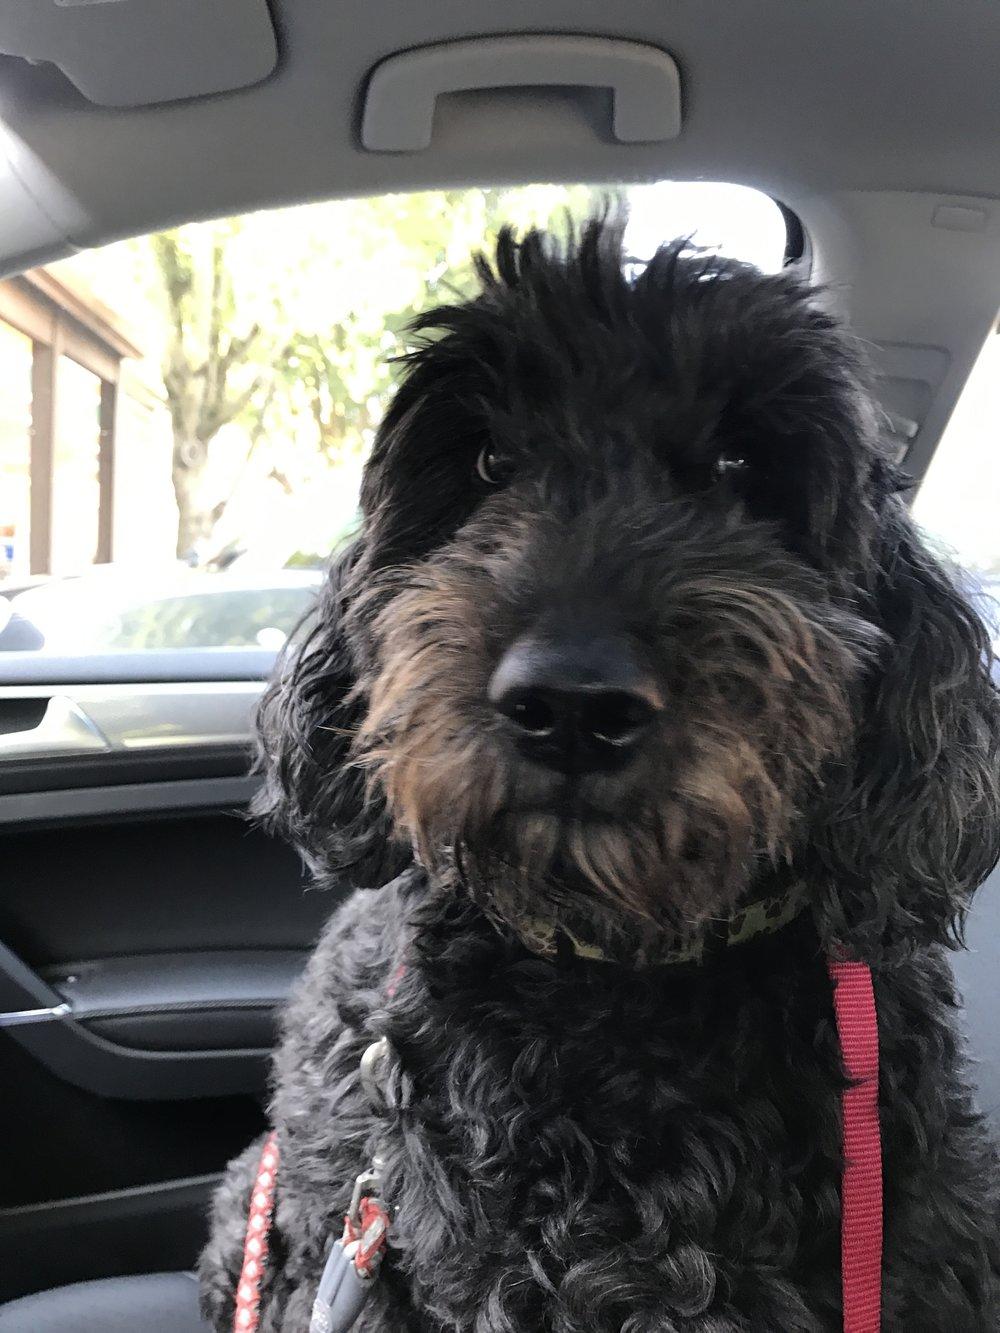 My dog Gumbo!